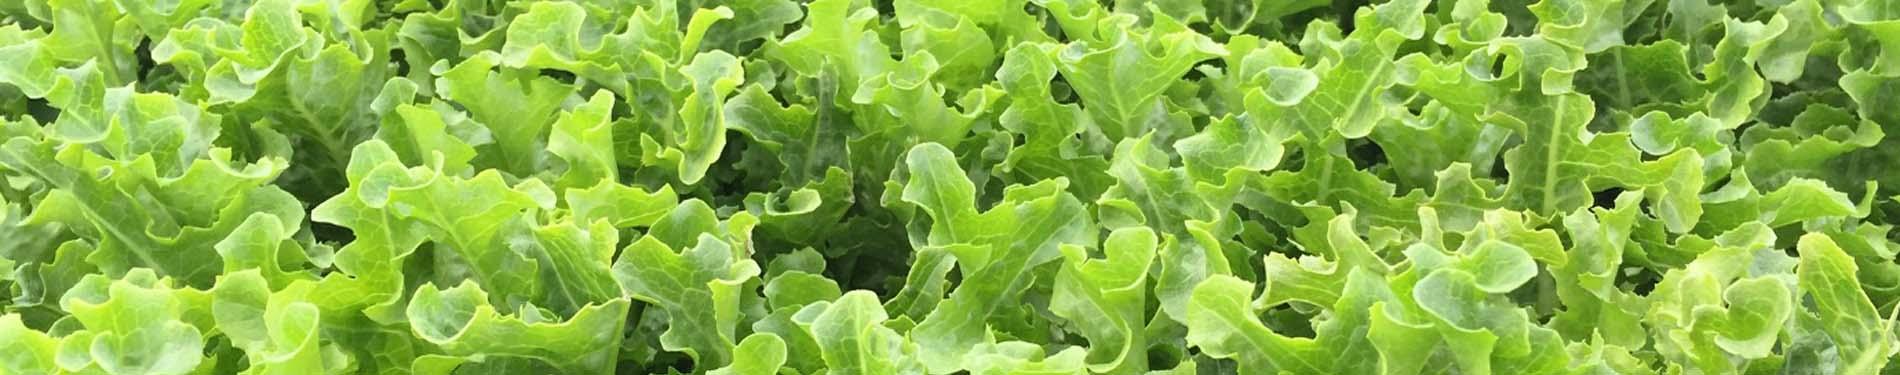 Curly Lettuce Banner